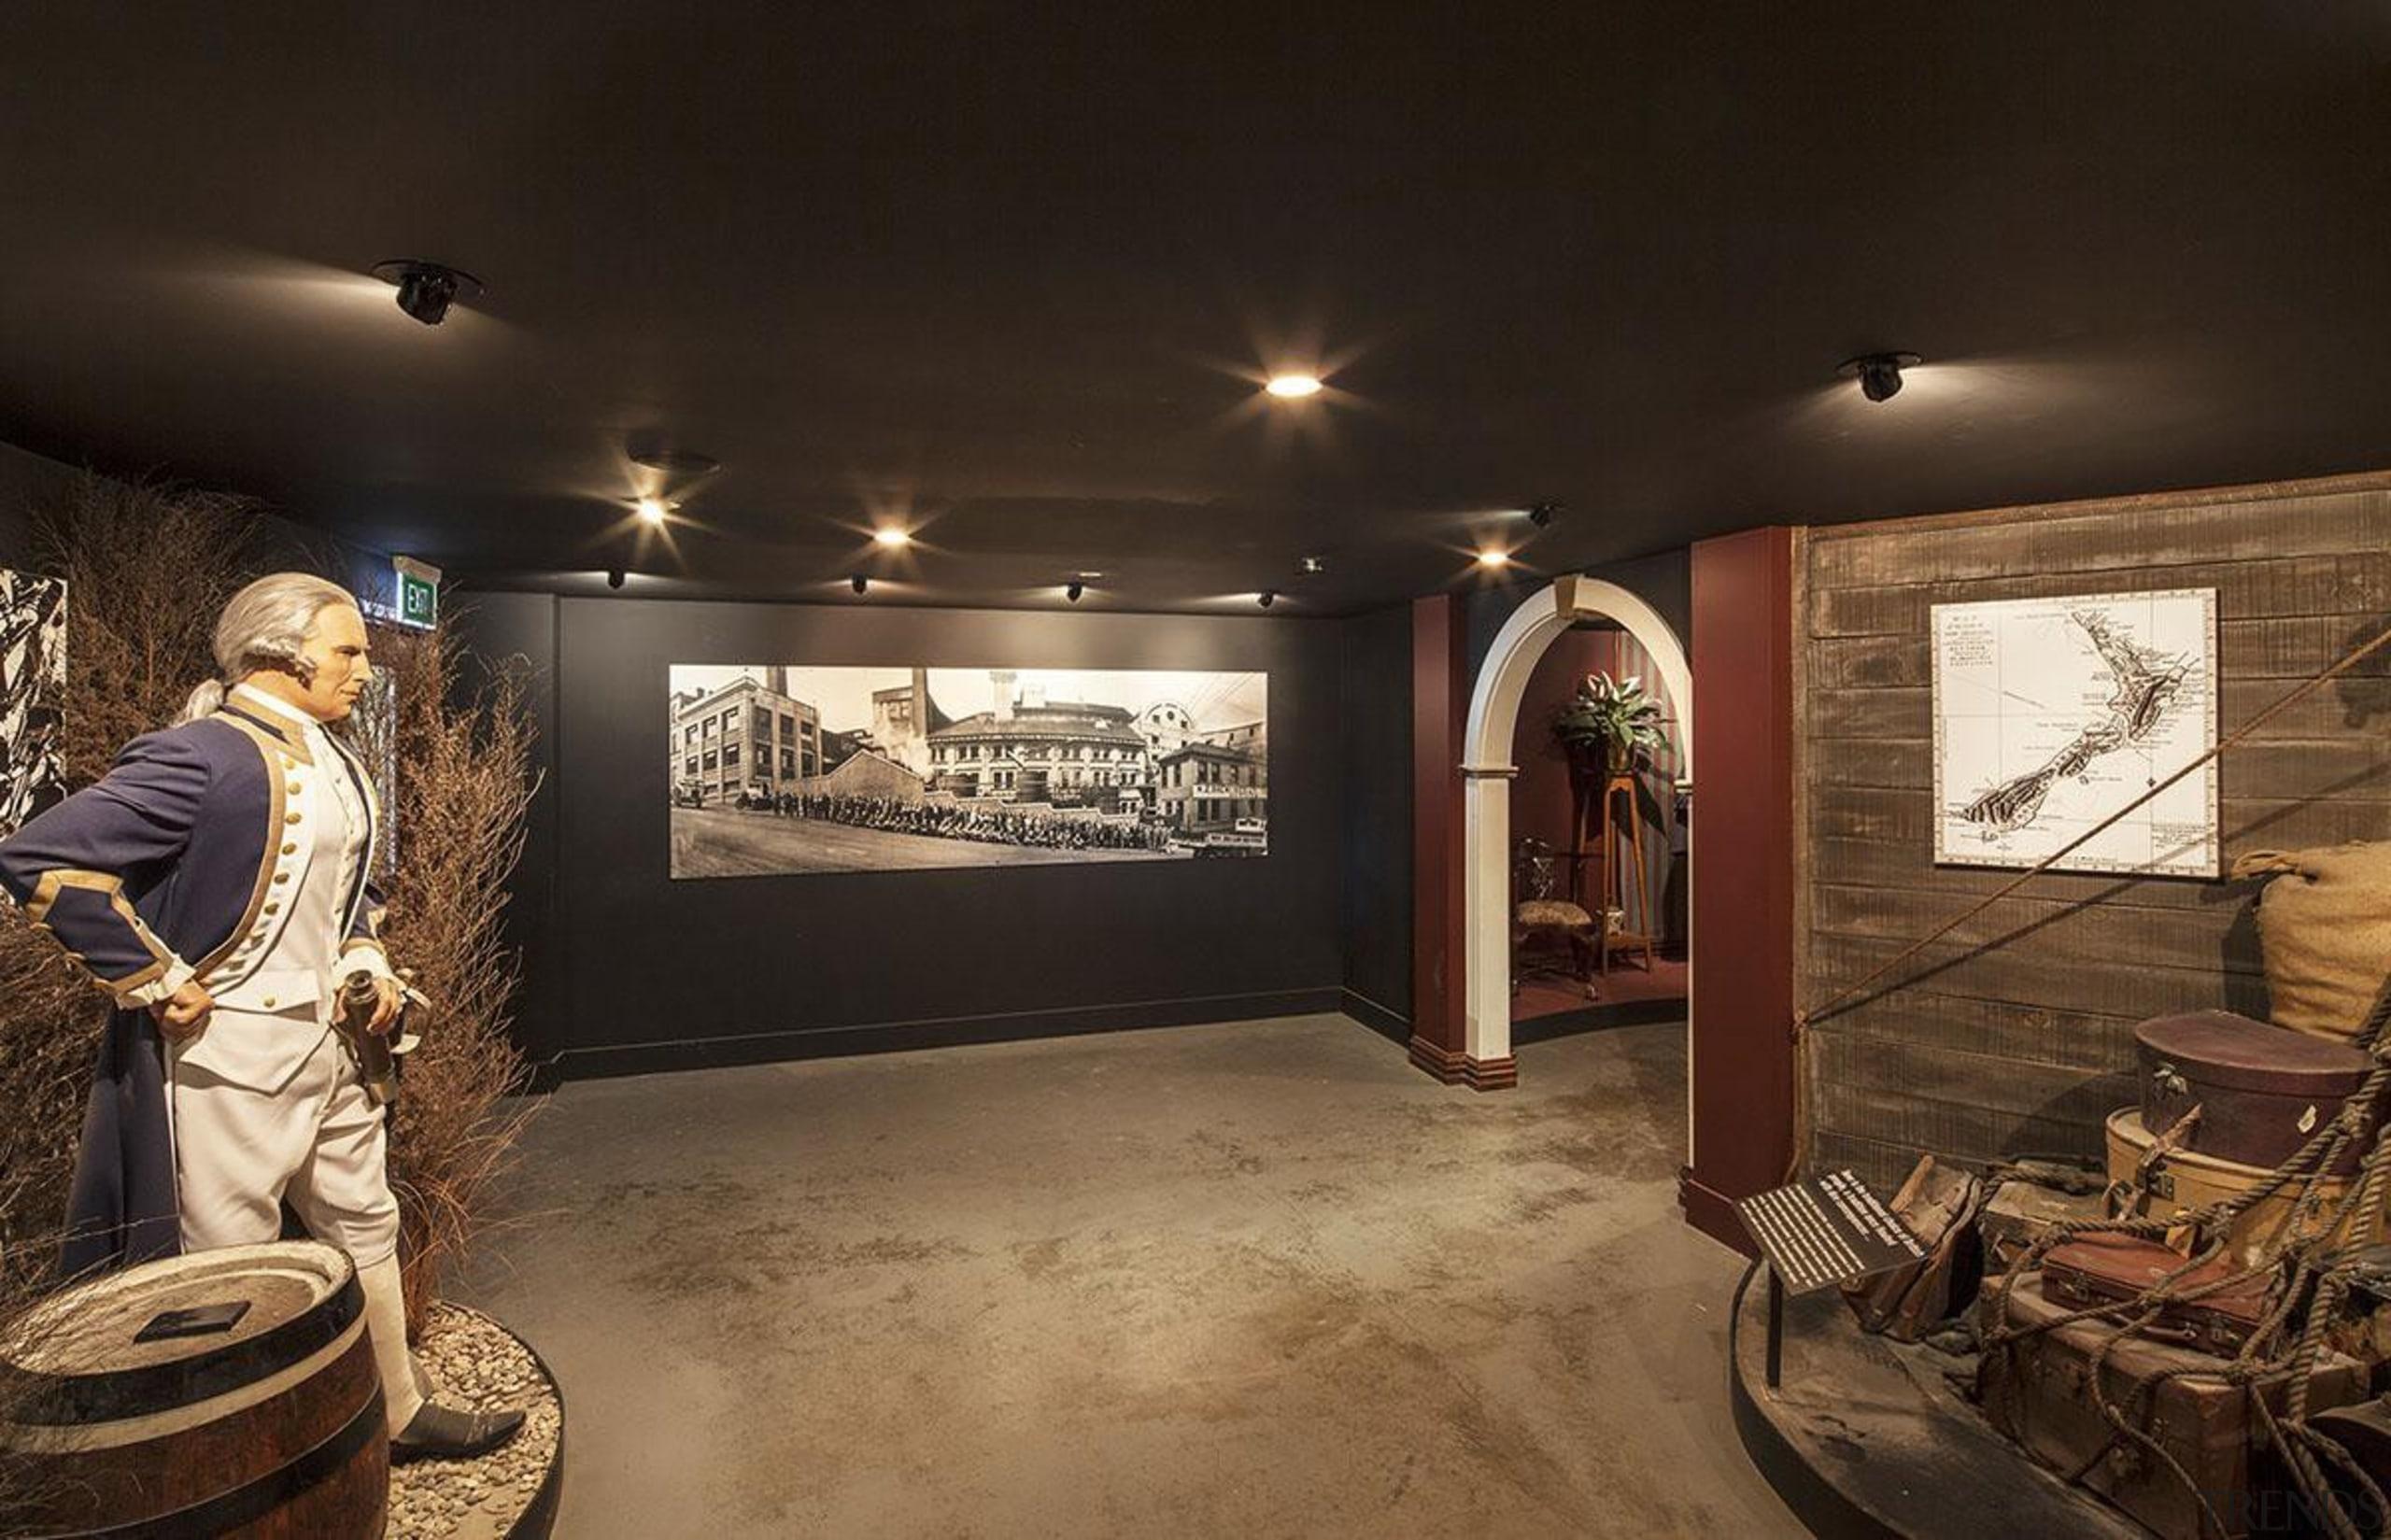 NOMINEESpeights Brewery (3 of 4) - Hawkins Contruction ceiling, exhibition, interior design, museum, tourist attraction, black, brown